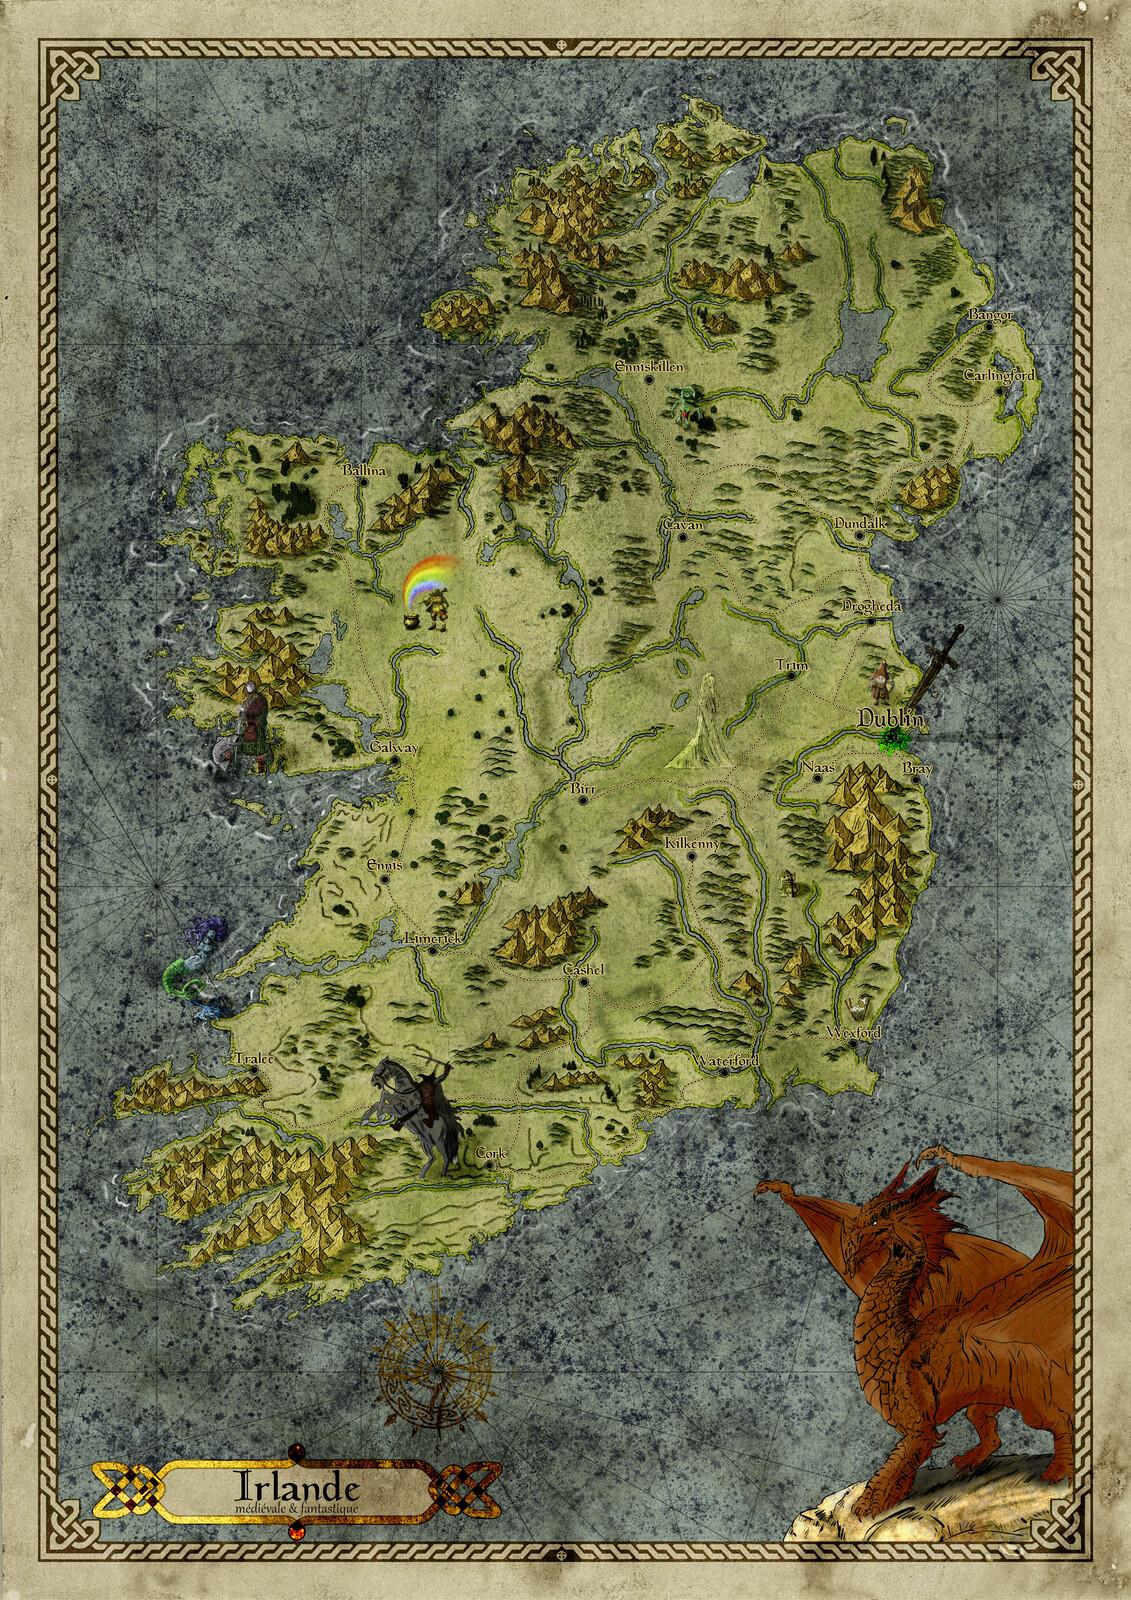 Irlande médiévale & Fantastique